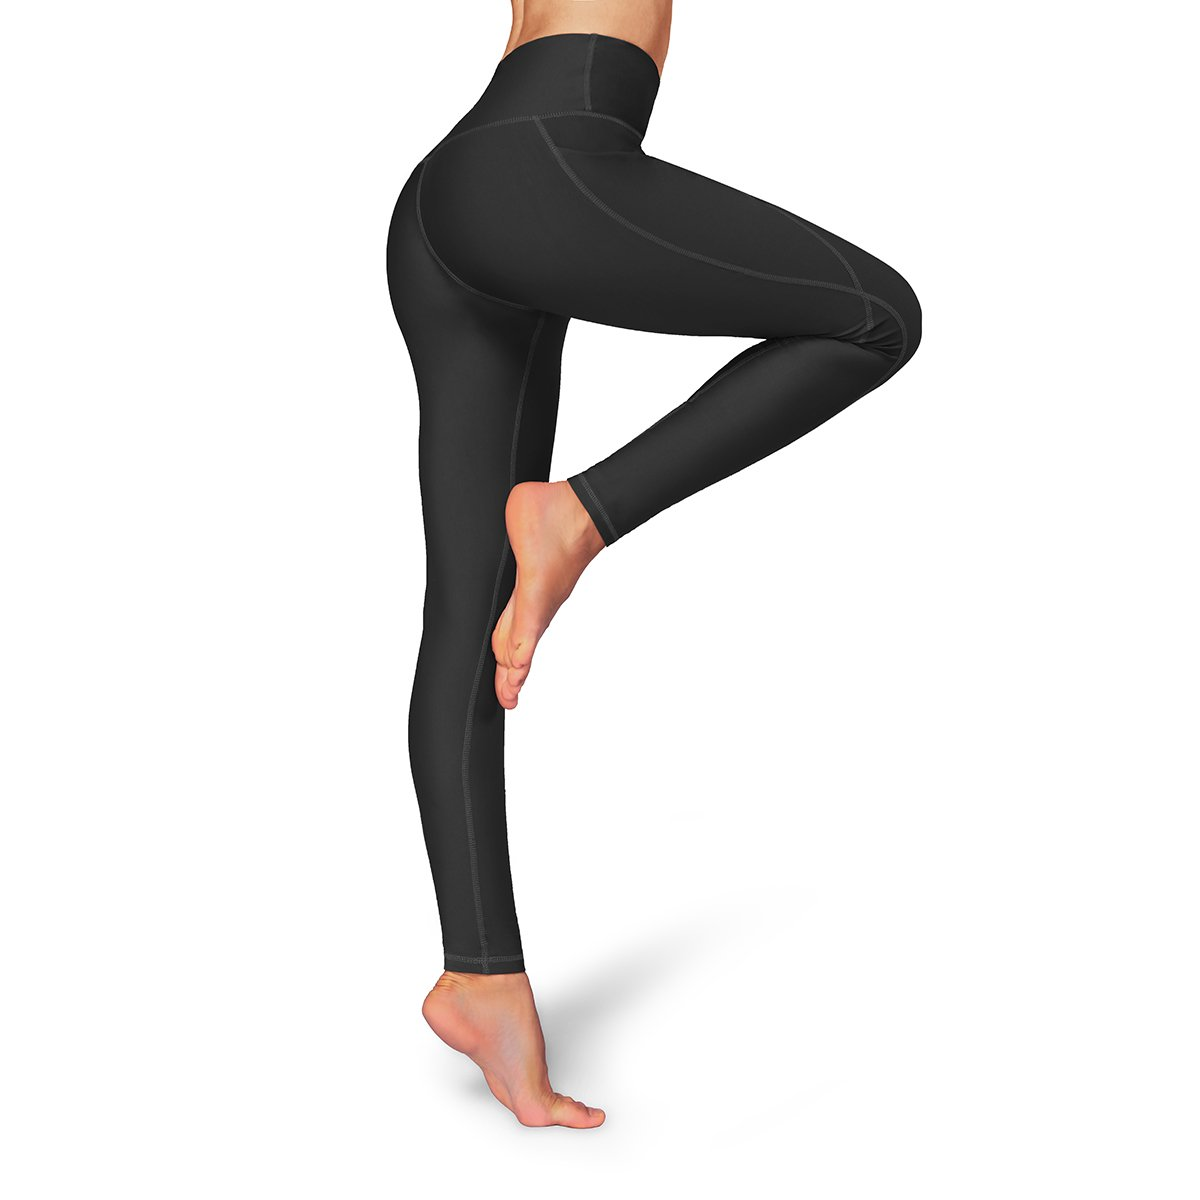 35cd4f052153ca Occffy High Waist Out Pocket Yoga Pants Womens Tummy Control Workout  Leggings Oc01: Amazon.co.uk: Sports & Outdoors